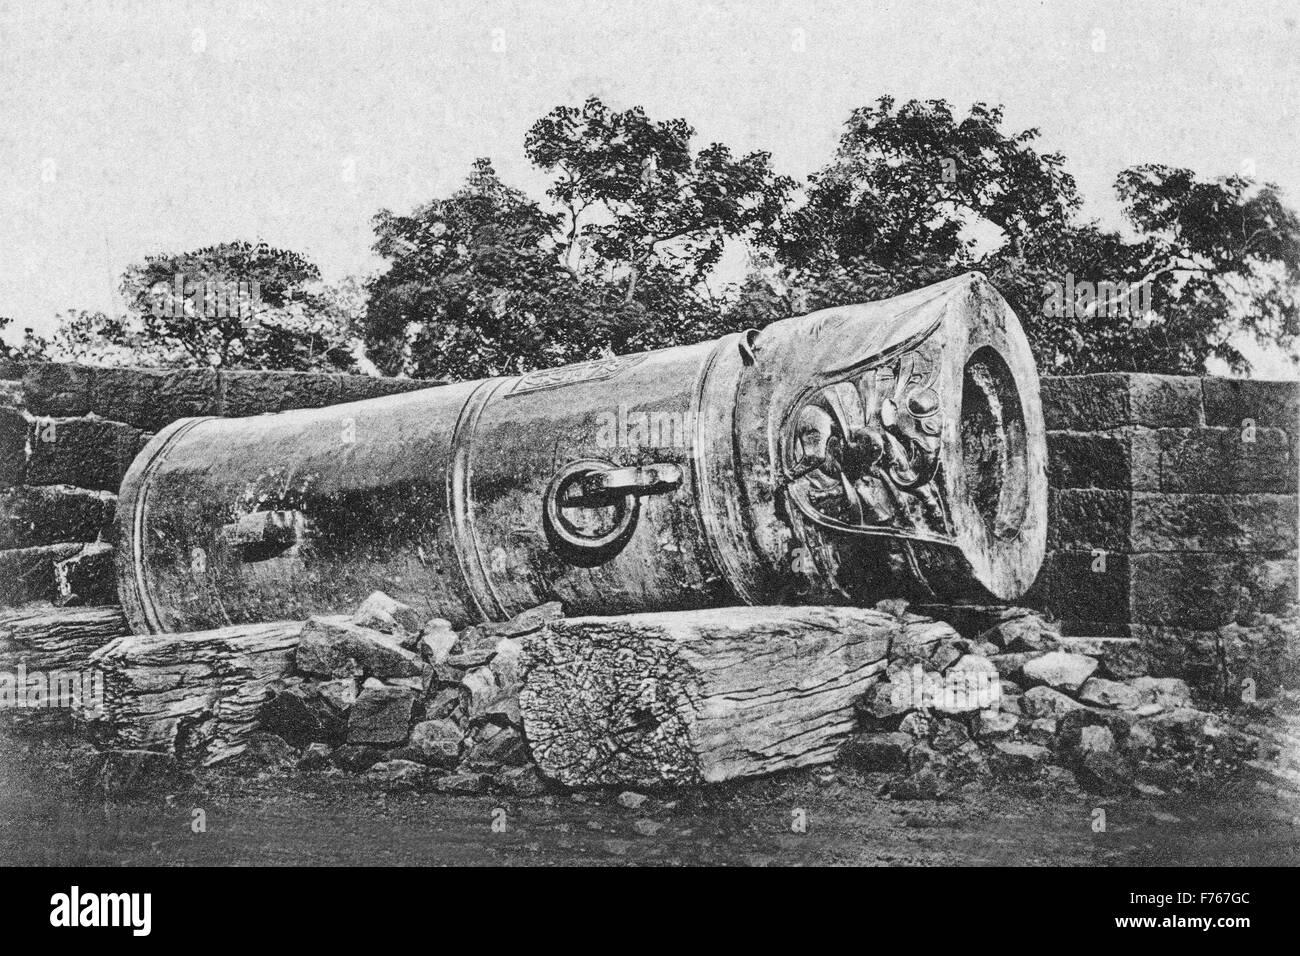 Malik maidan gun, bijapur, karnataka, india, asia - Stock Image